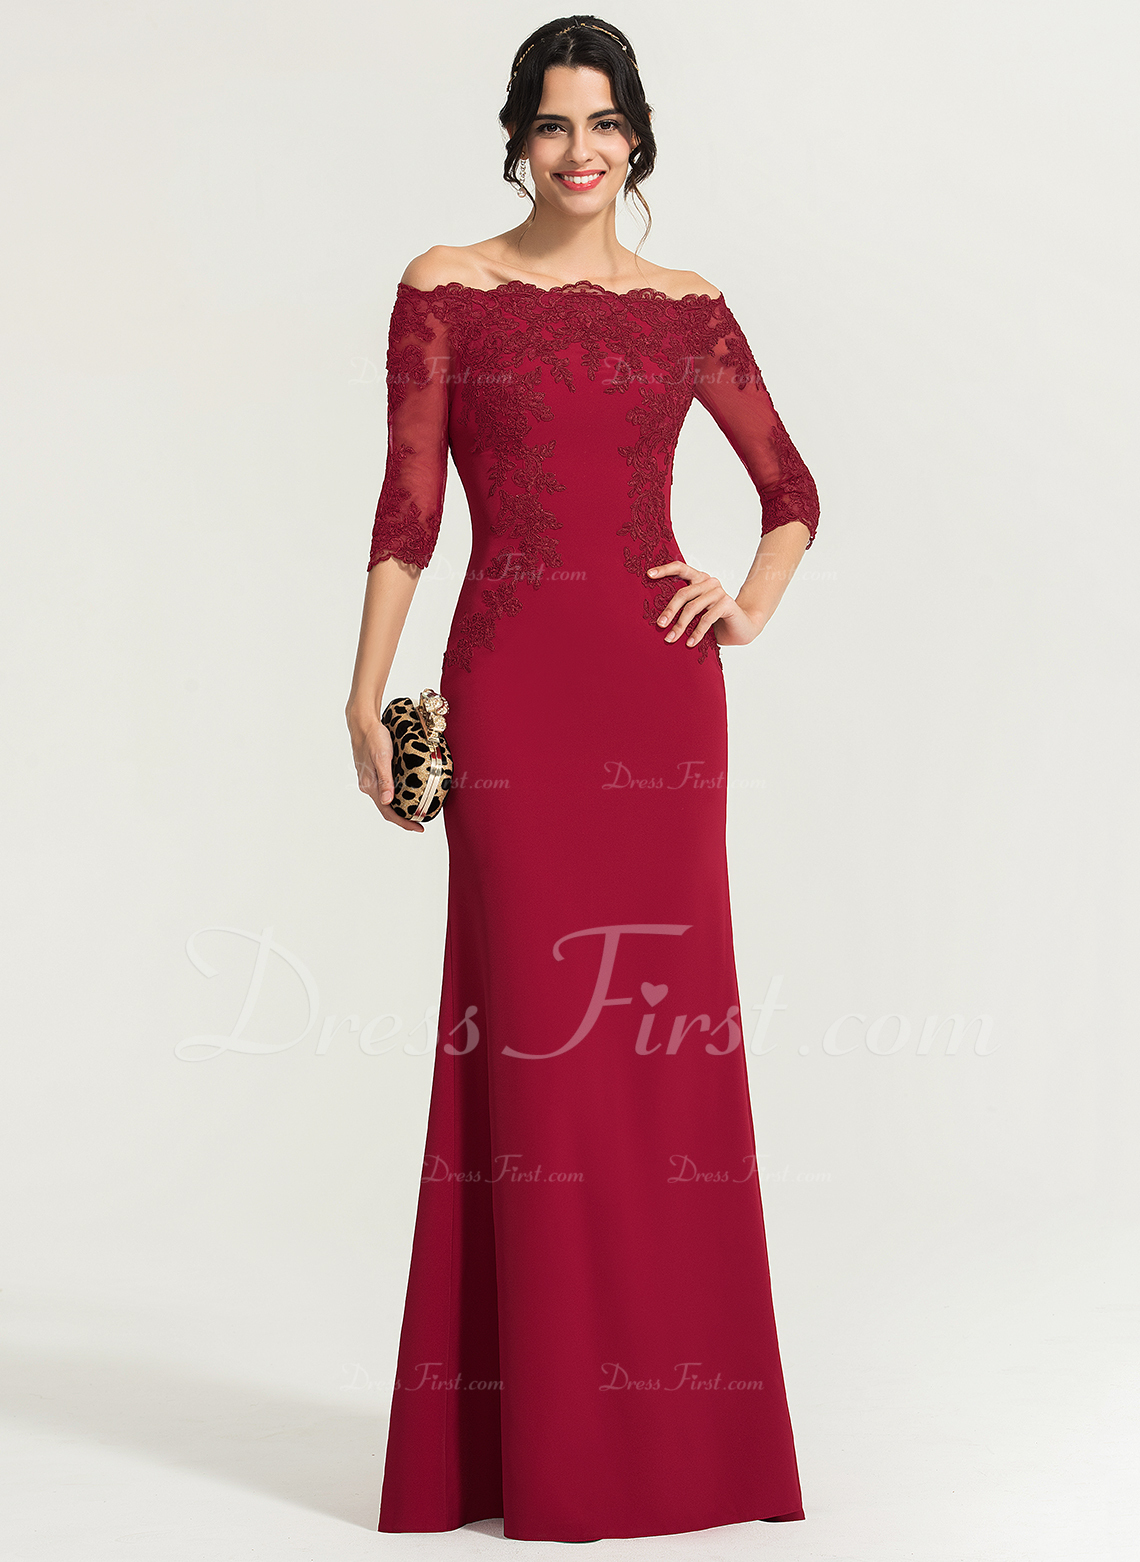 Sheath/Column Off-the-Shoulder Floor-Length Stretch Crepe Evening Dress